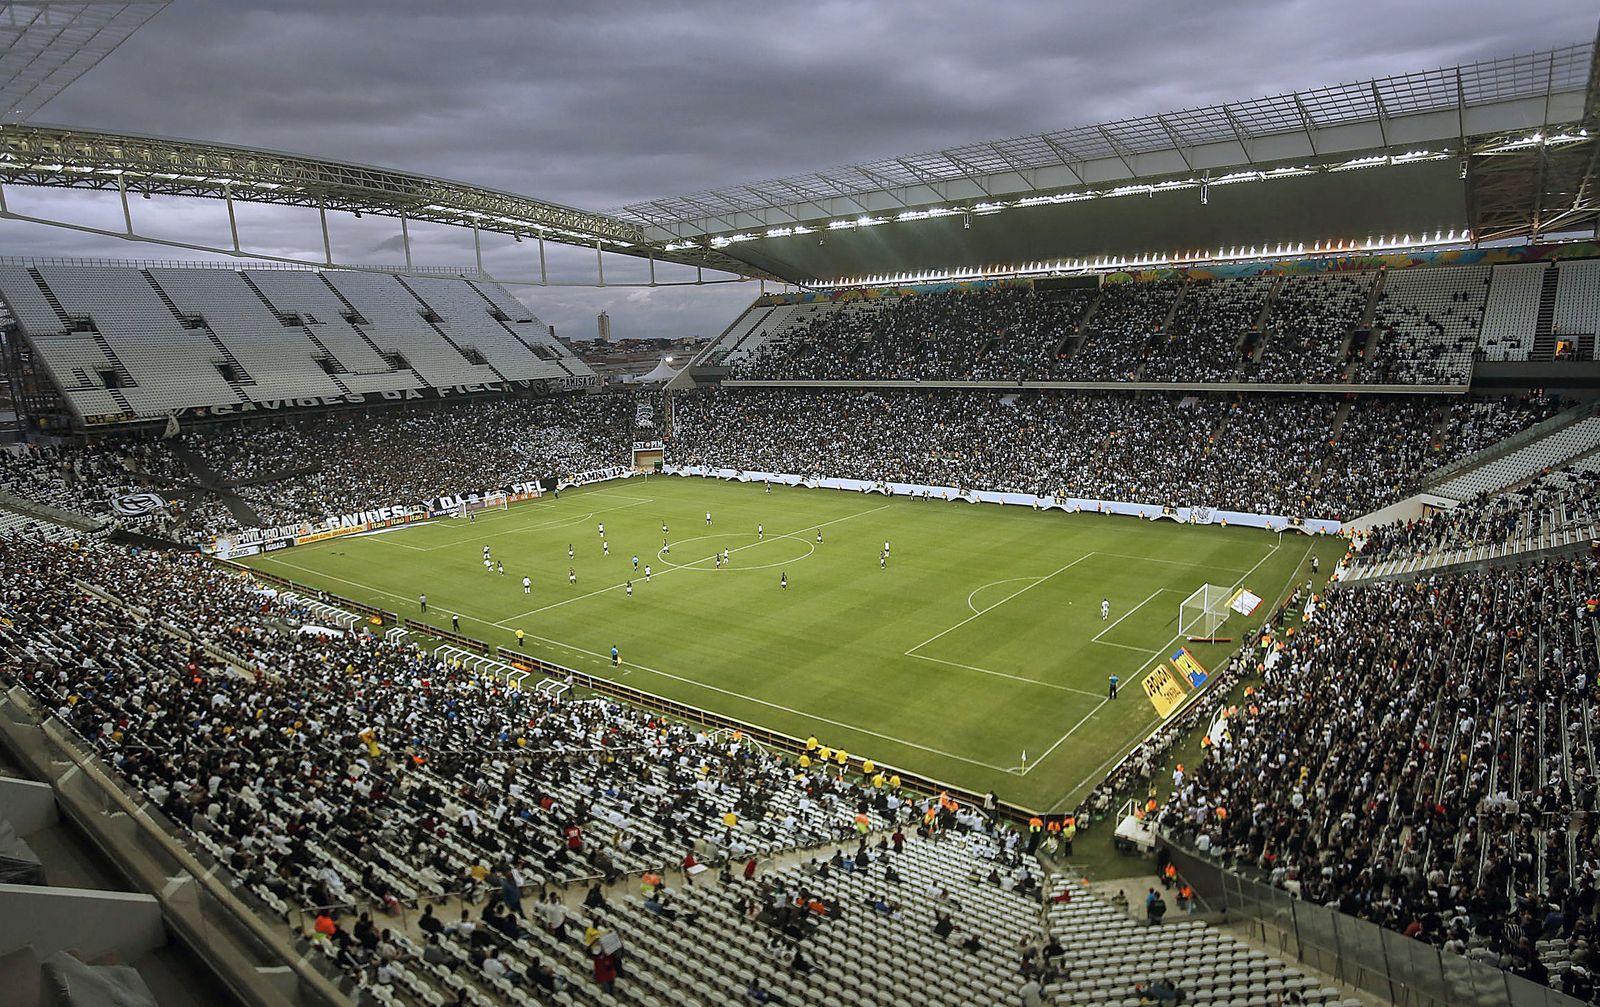 WM-Stadien 2014/ Arena Corinthians